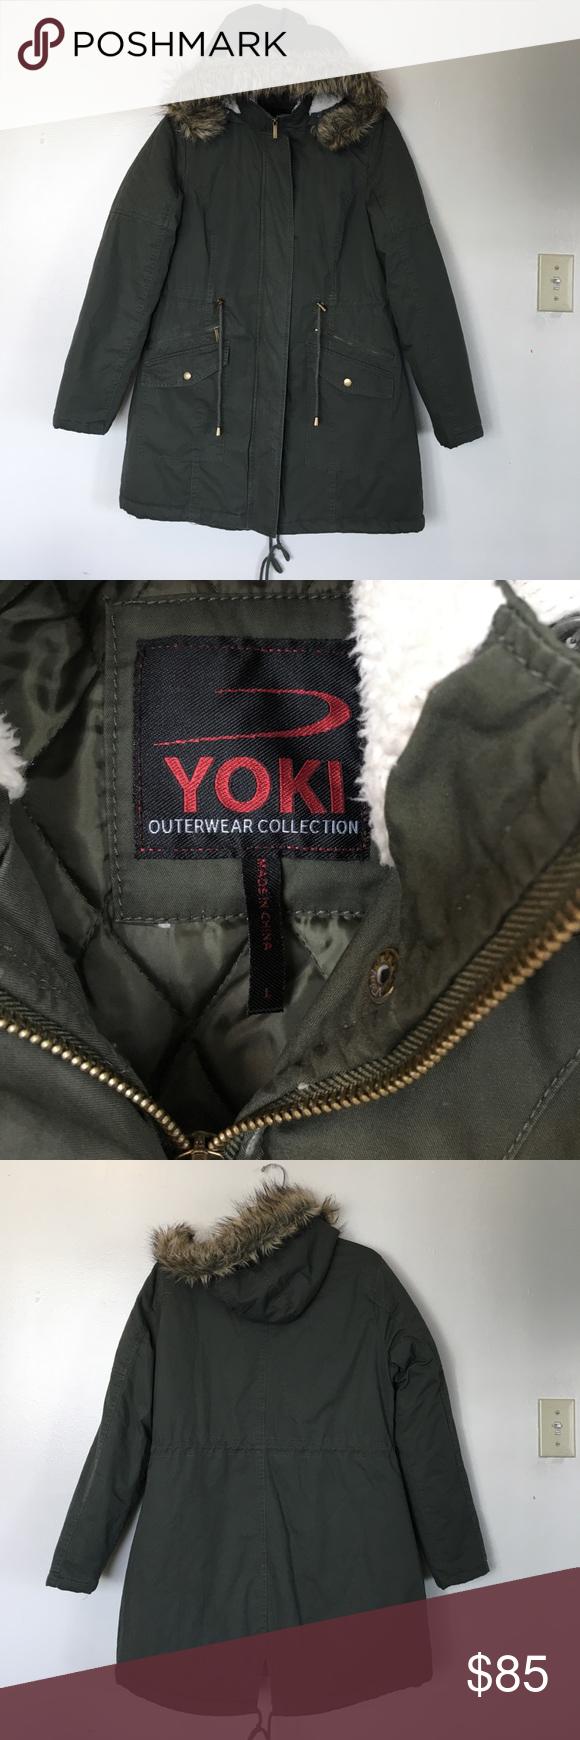 Yoki Jacket Size Large Clothes Design Coats Jackets Women Womens Utility Jacket [ 1740 x 580 Pixel ]